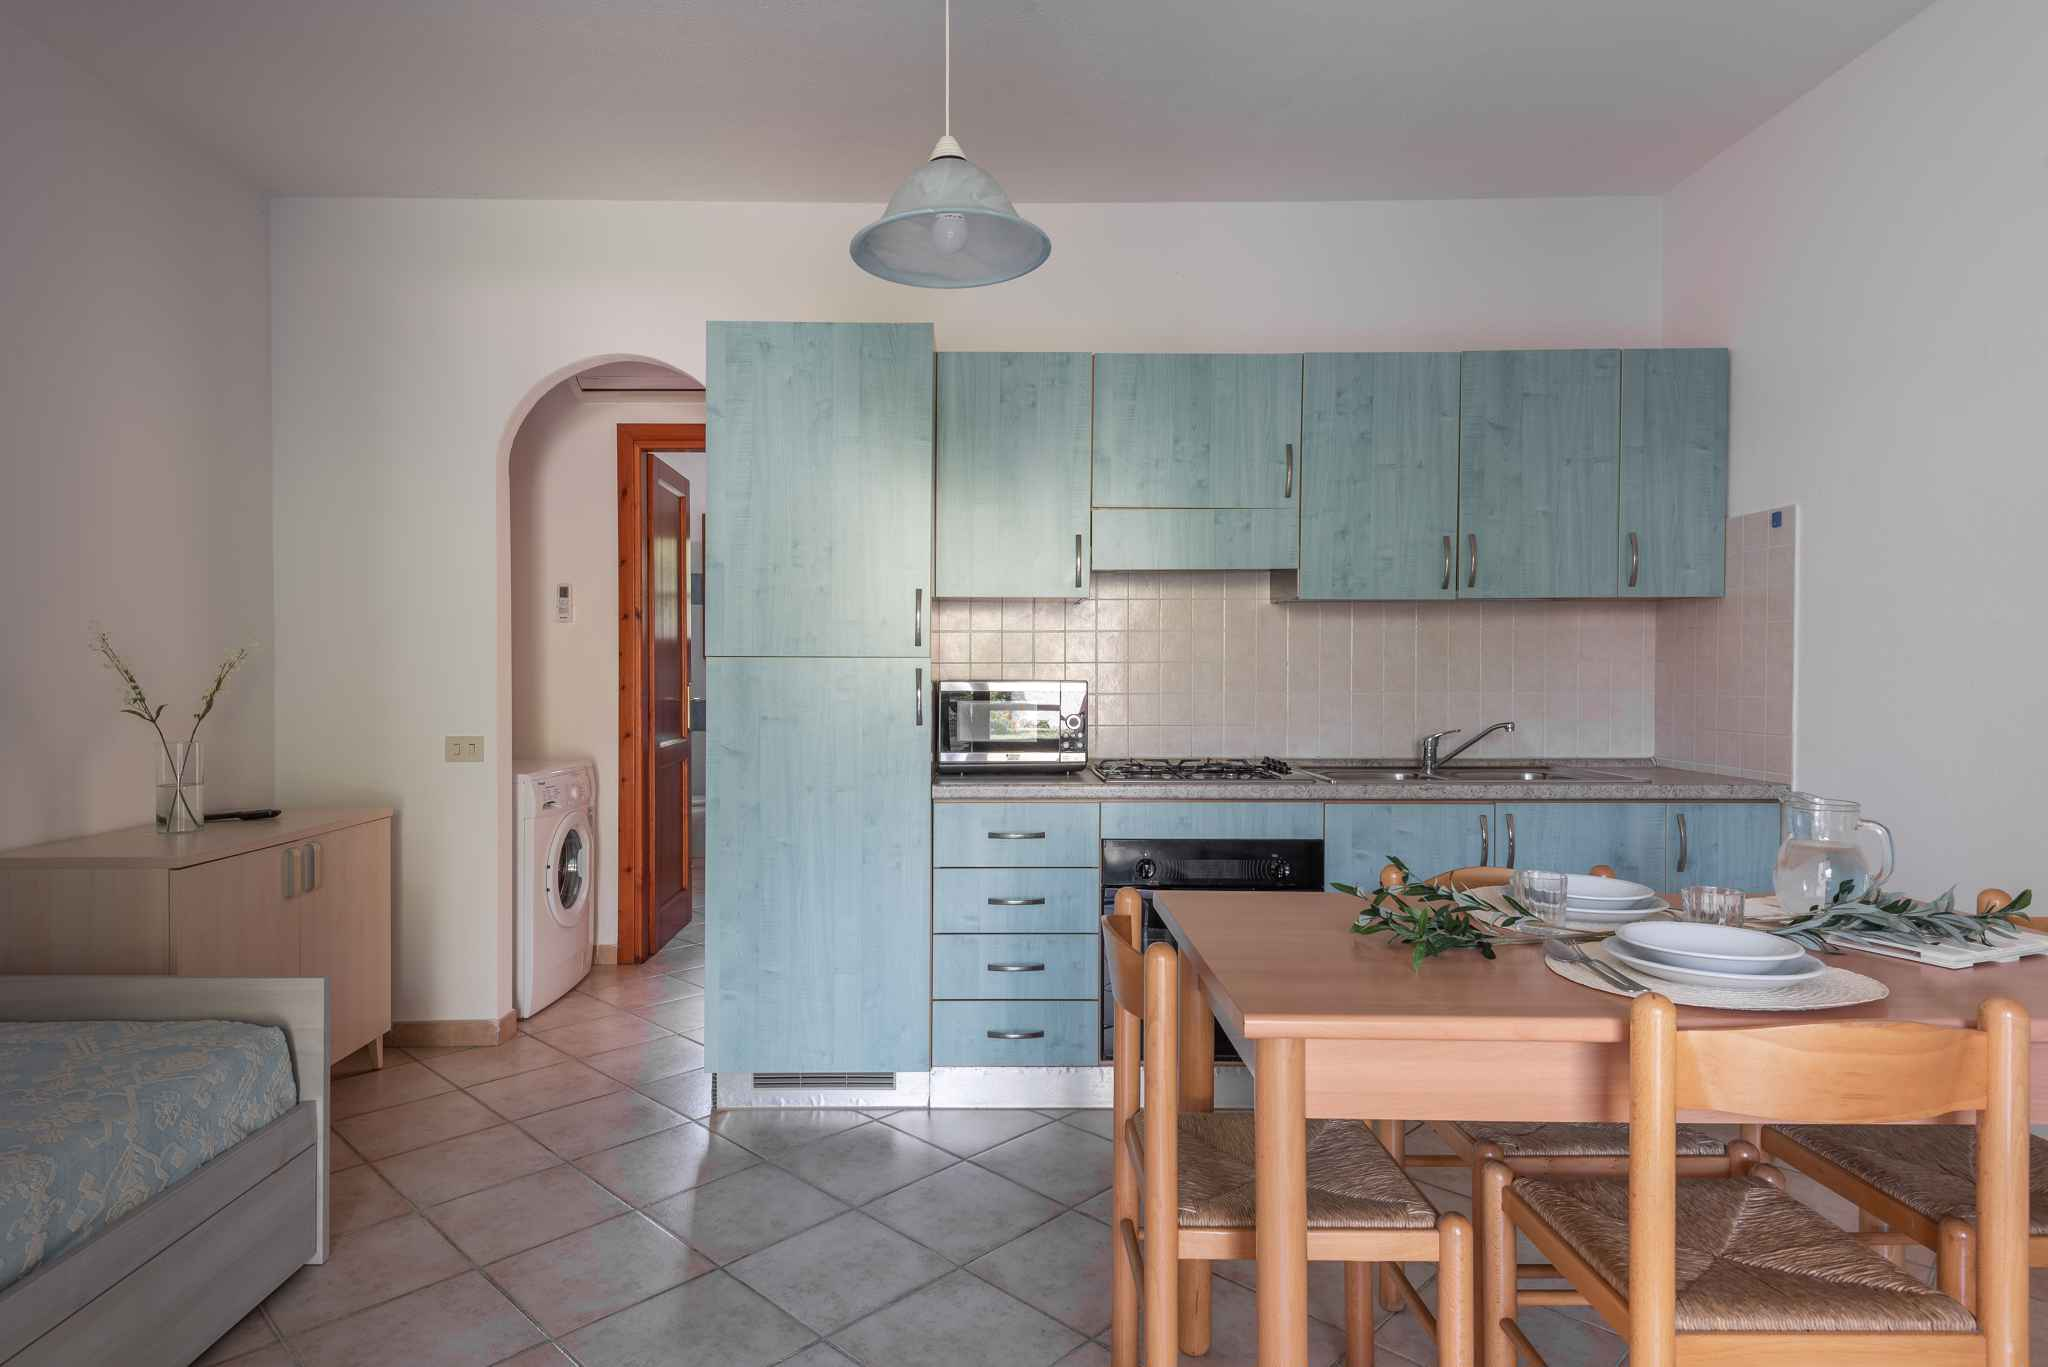 Ferienwohnung Appartamento 2 persone (2853259), Budoni, Olbia-Tempio, Sardinien, Italien, Bild 8